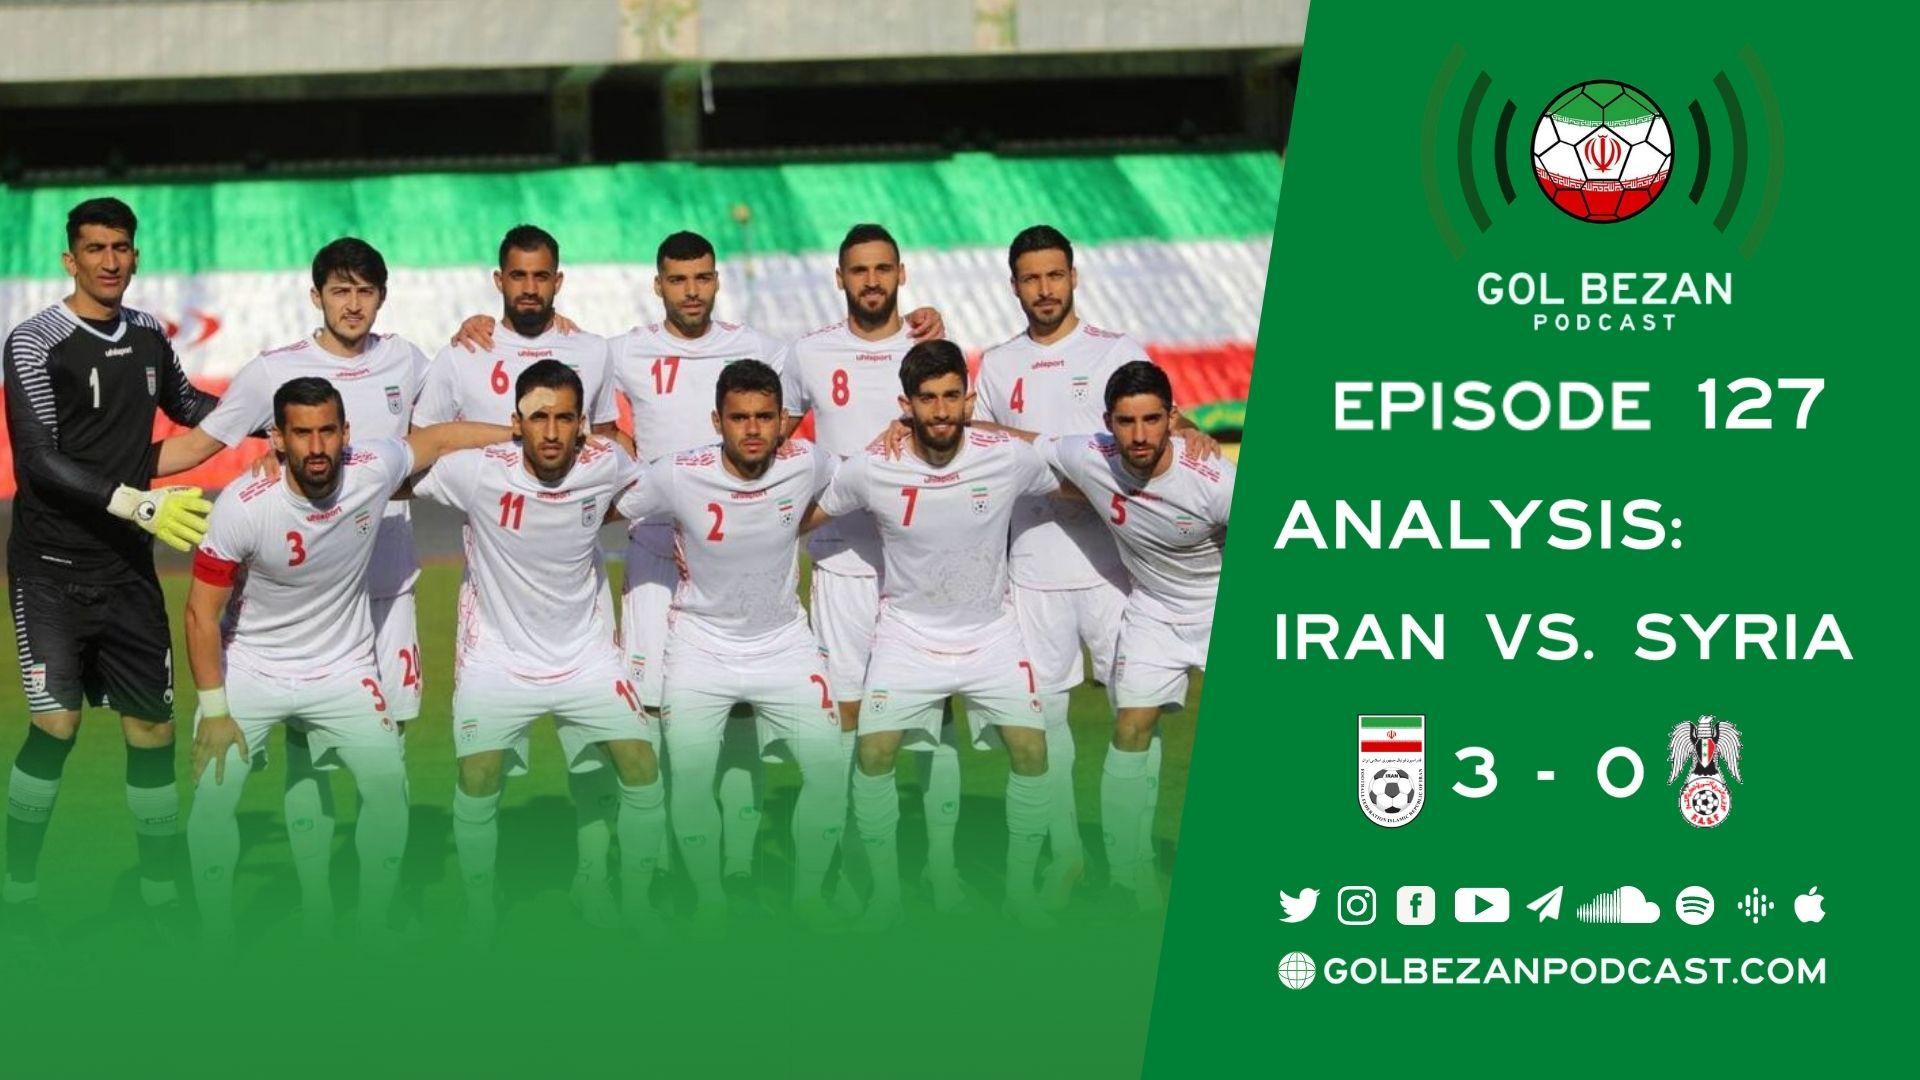 Analysis: Iran vs. Syria